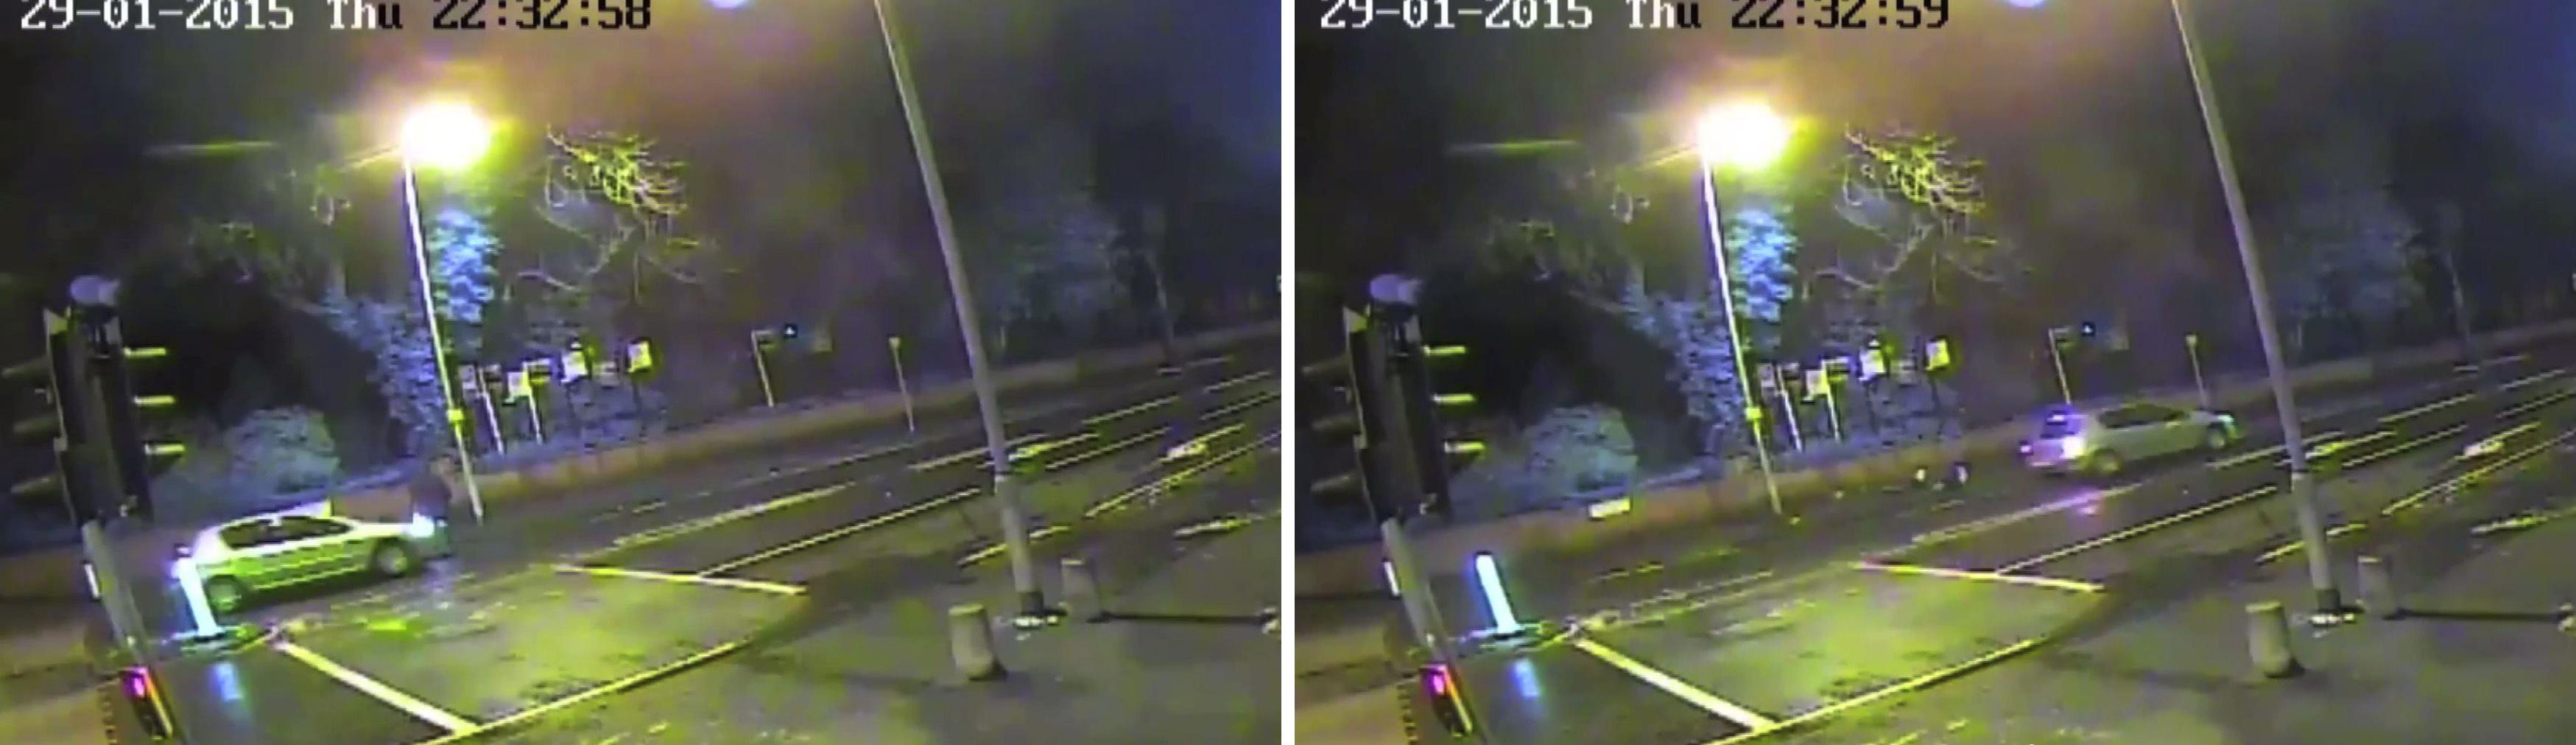 Handout CCTV footage